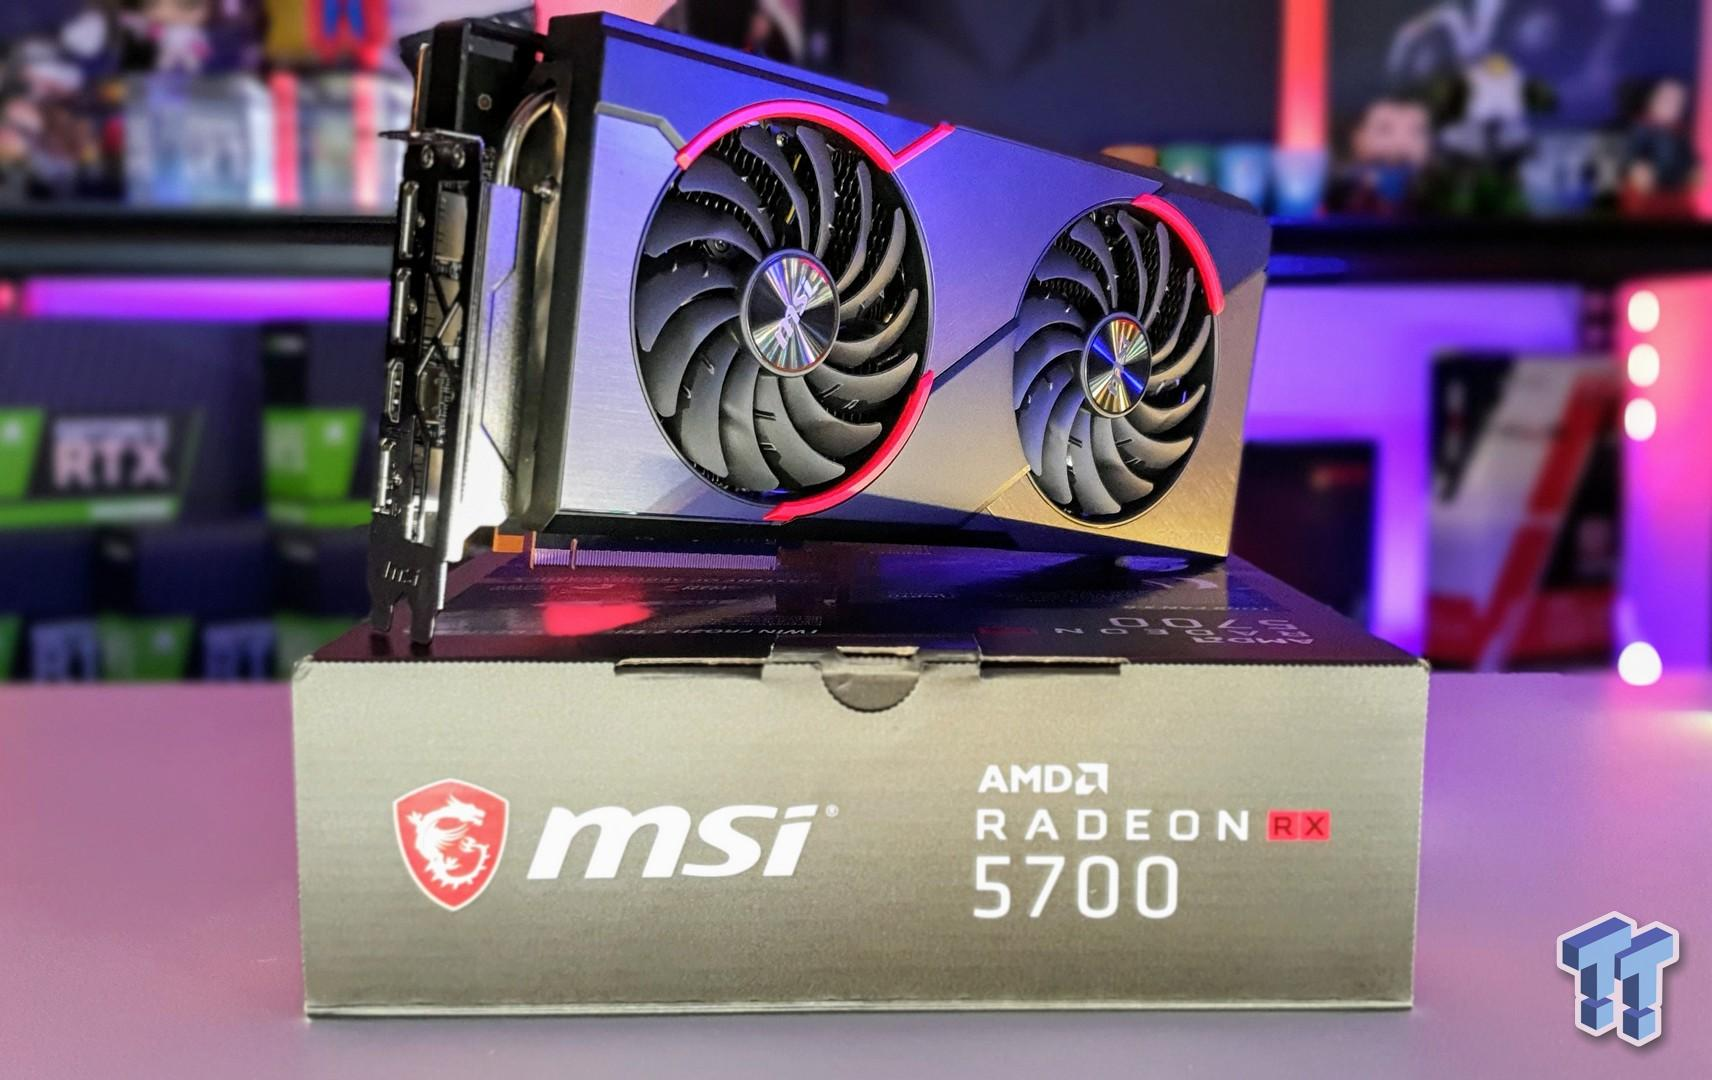 msi-radeon-rx-5700-gaming-review_514